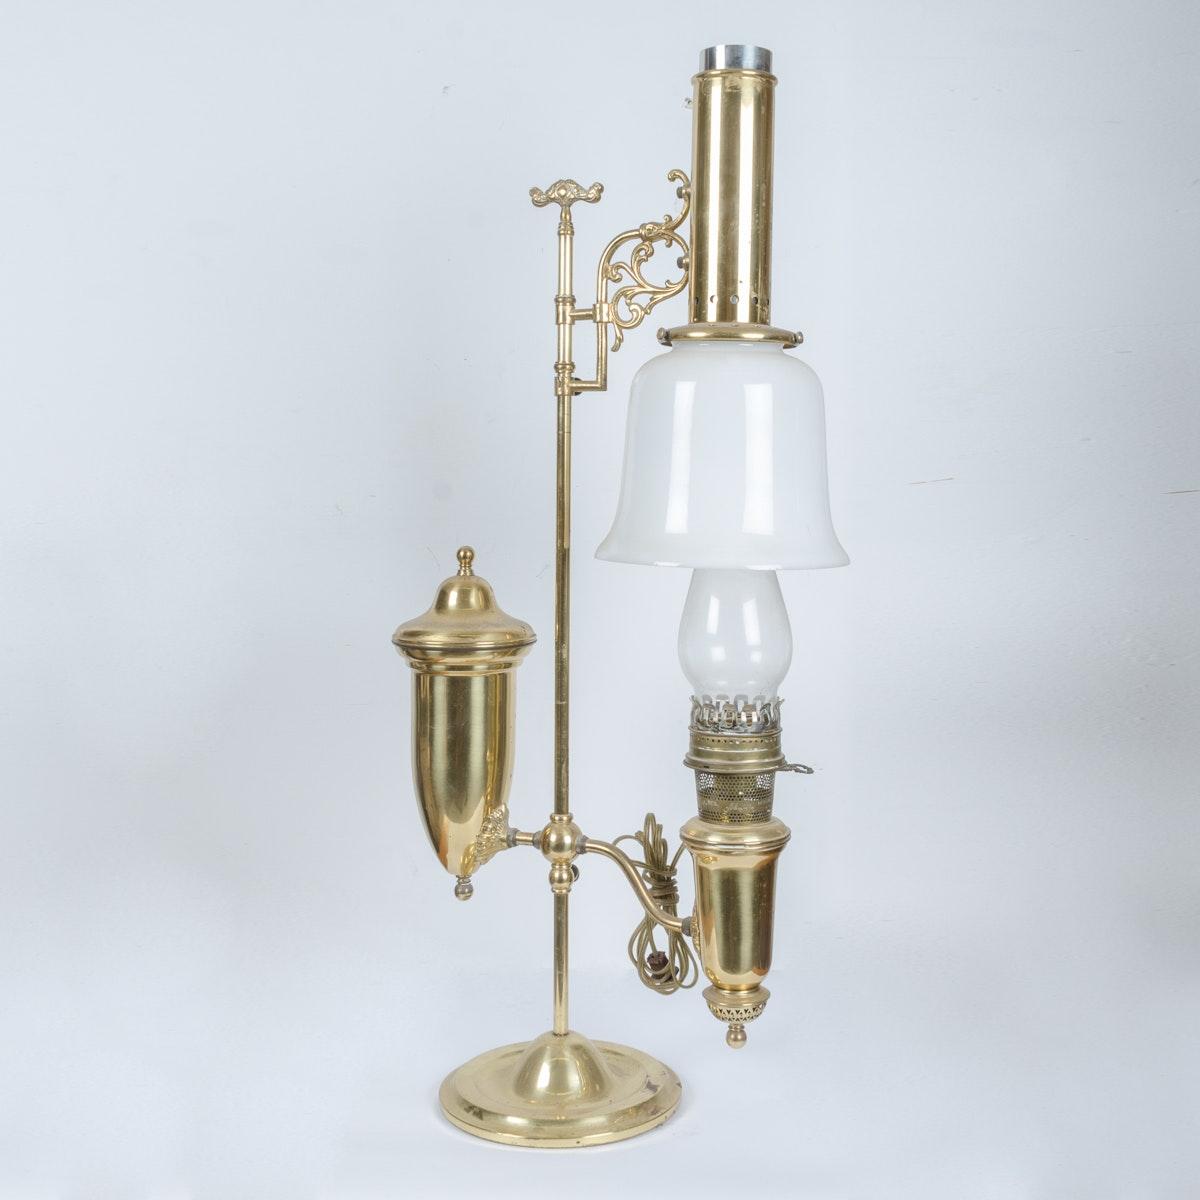 Vintage Converted Manhattan Student Brass Lamp